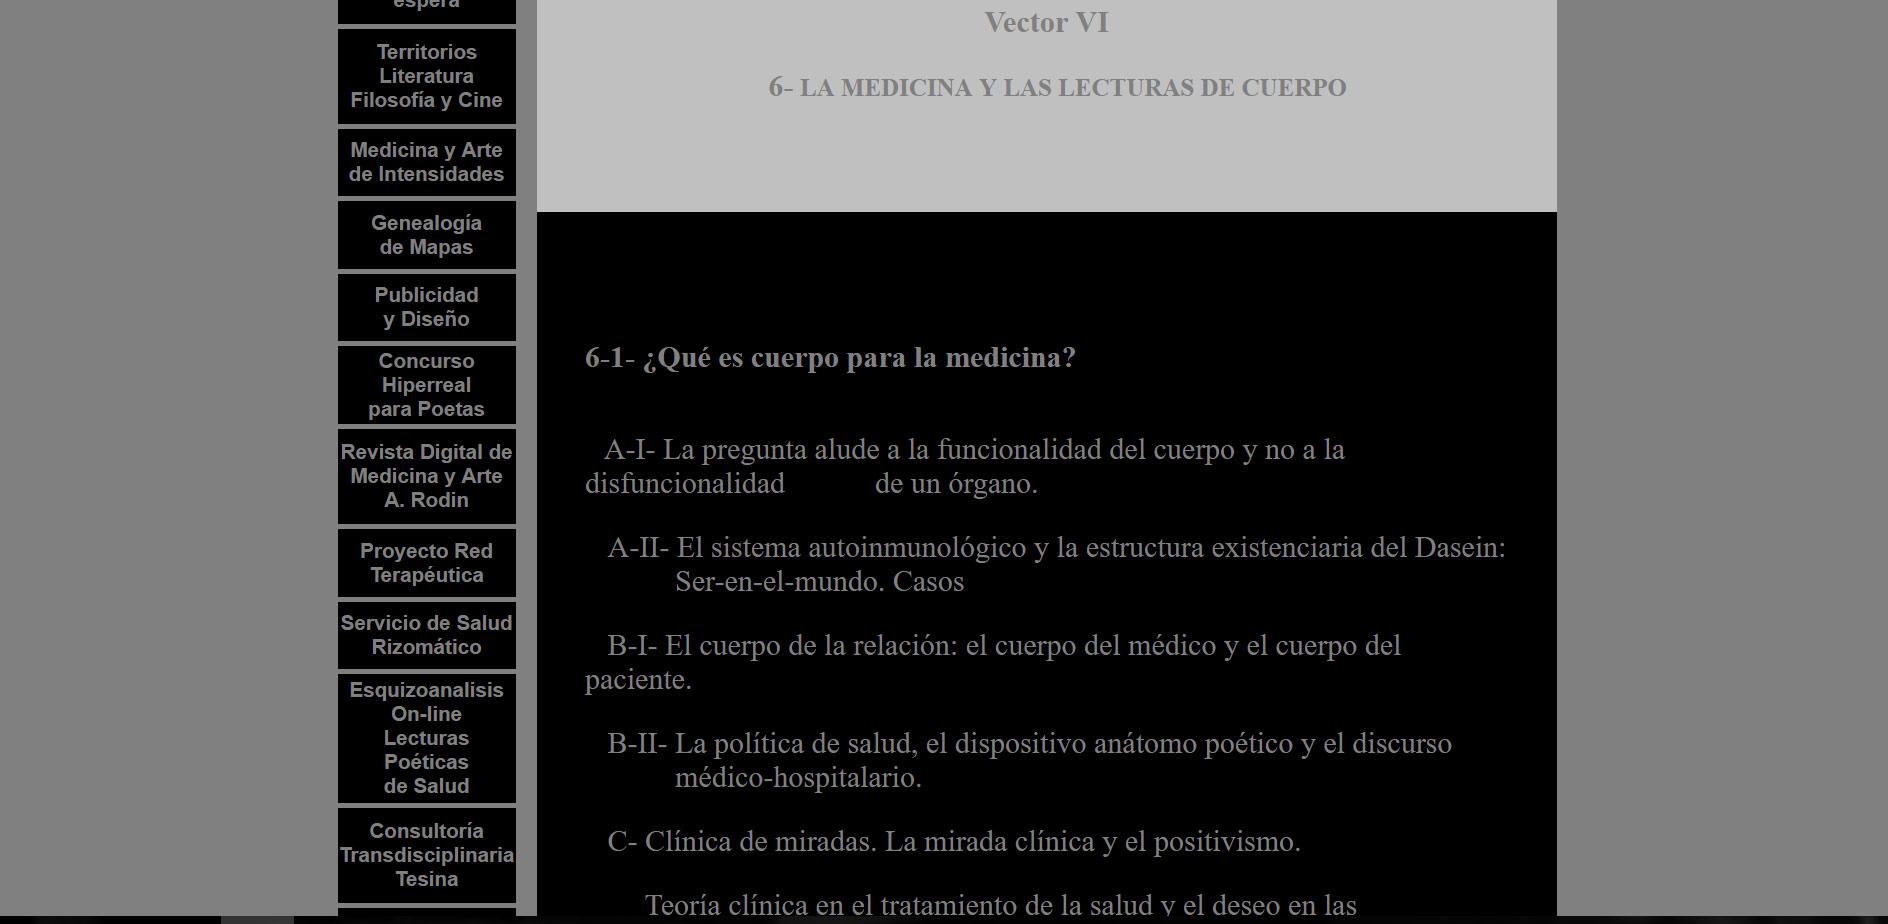 http://www.medicinayarte.com/img/la_medicina_la_lectura.jpg